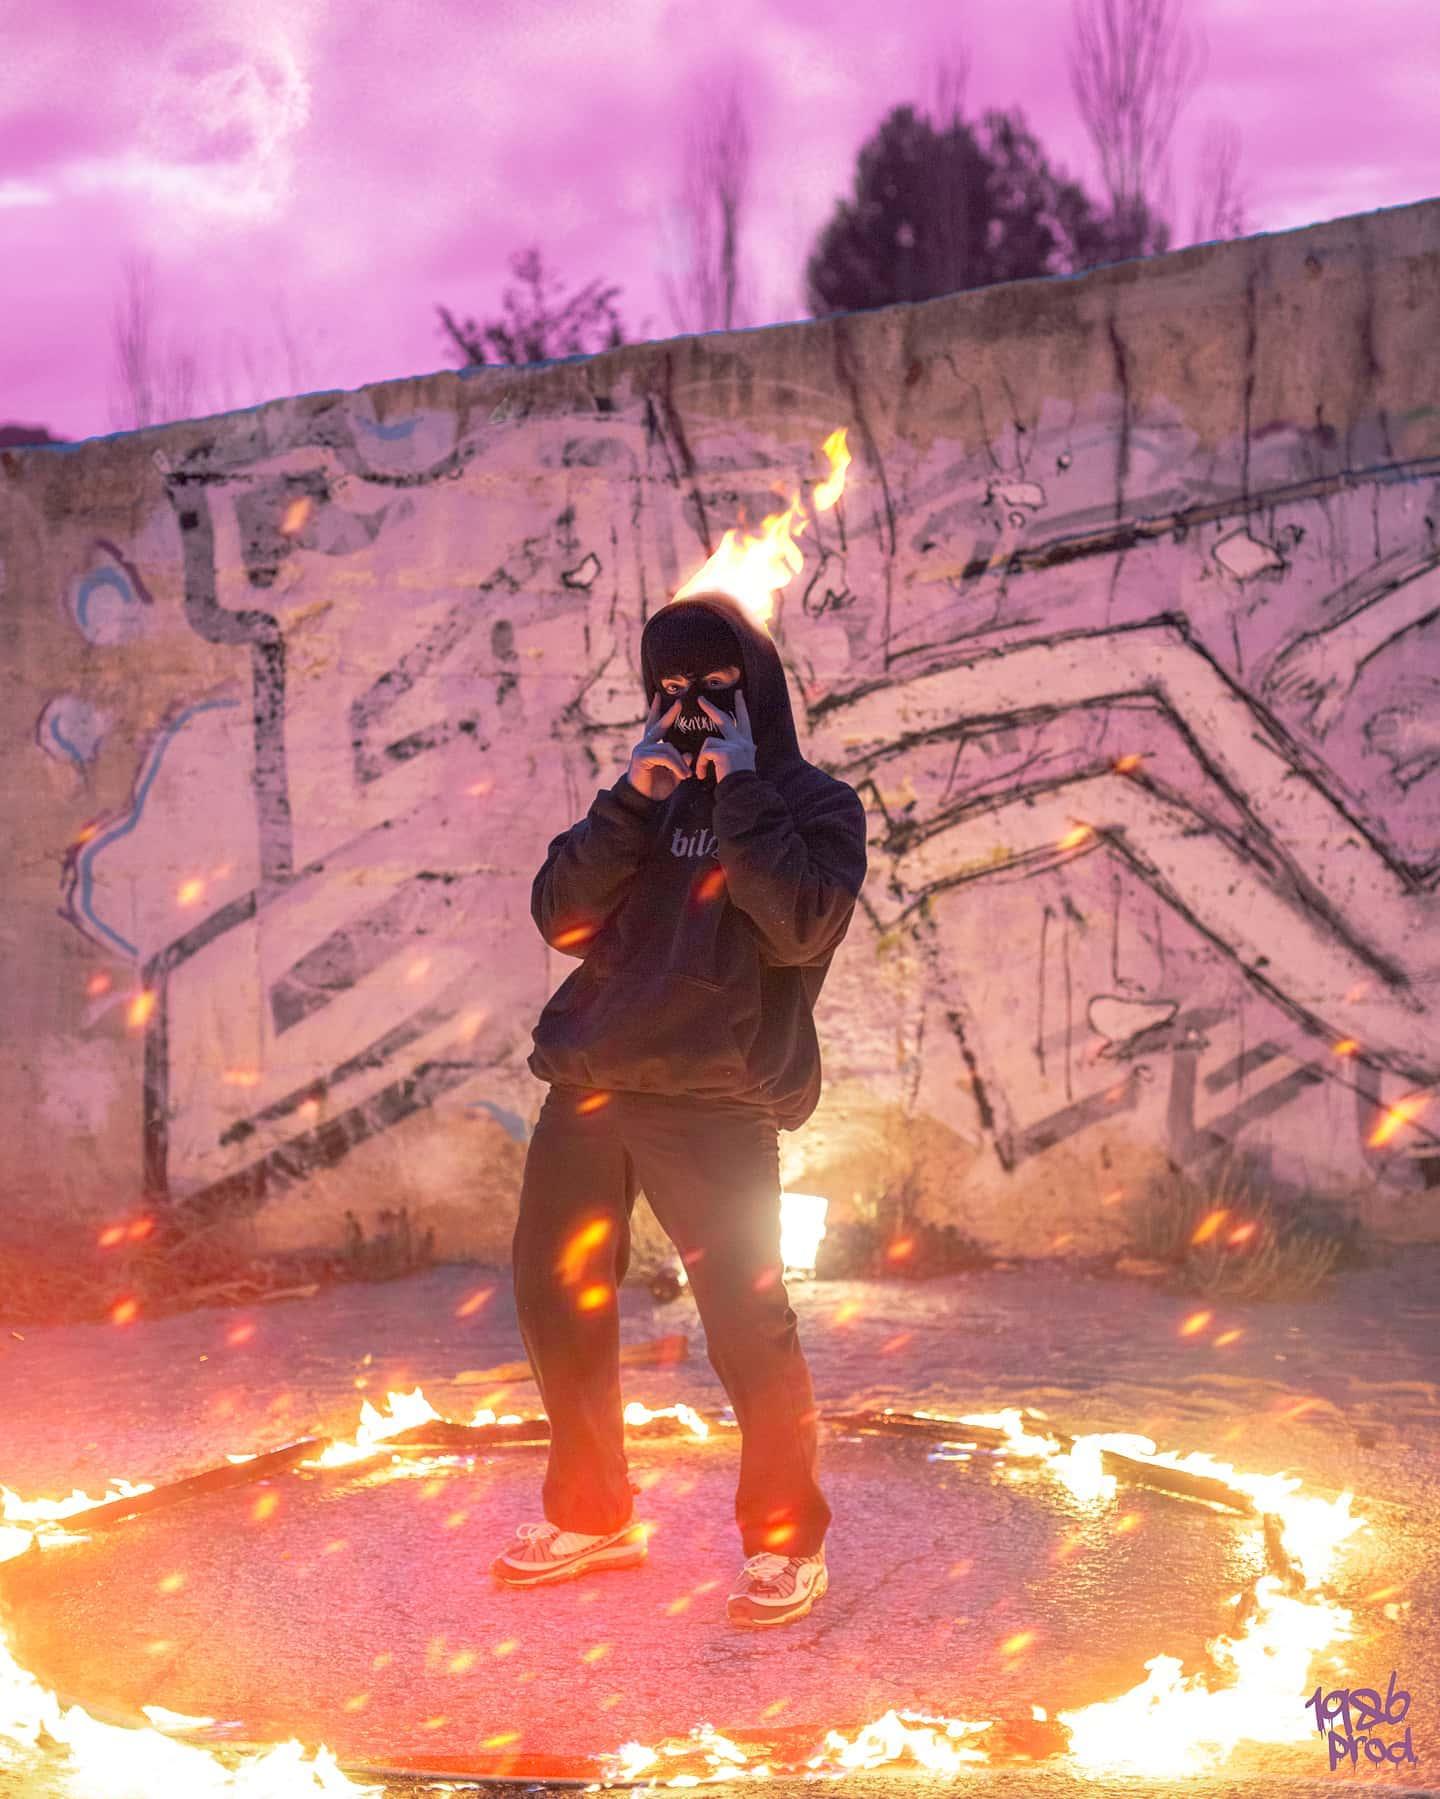 graffiti pink lightroompresets dark composition fire streetwear photography grunge